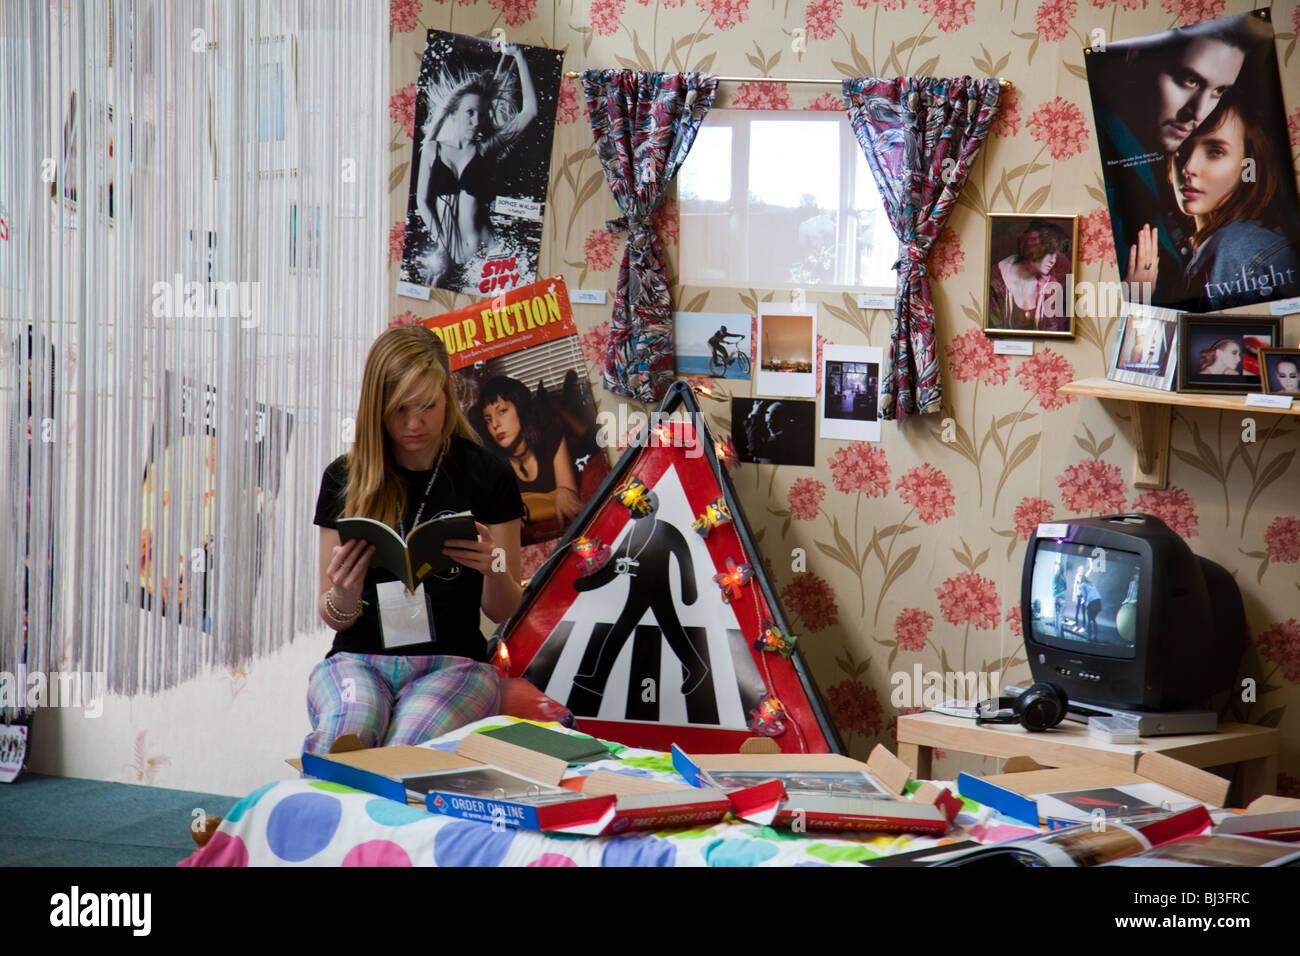 Teenage Room With Posters teenage girl bedroom posters stock photos & teenage girl bedroom